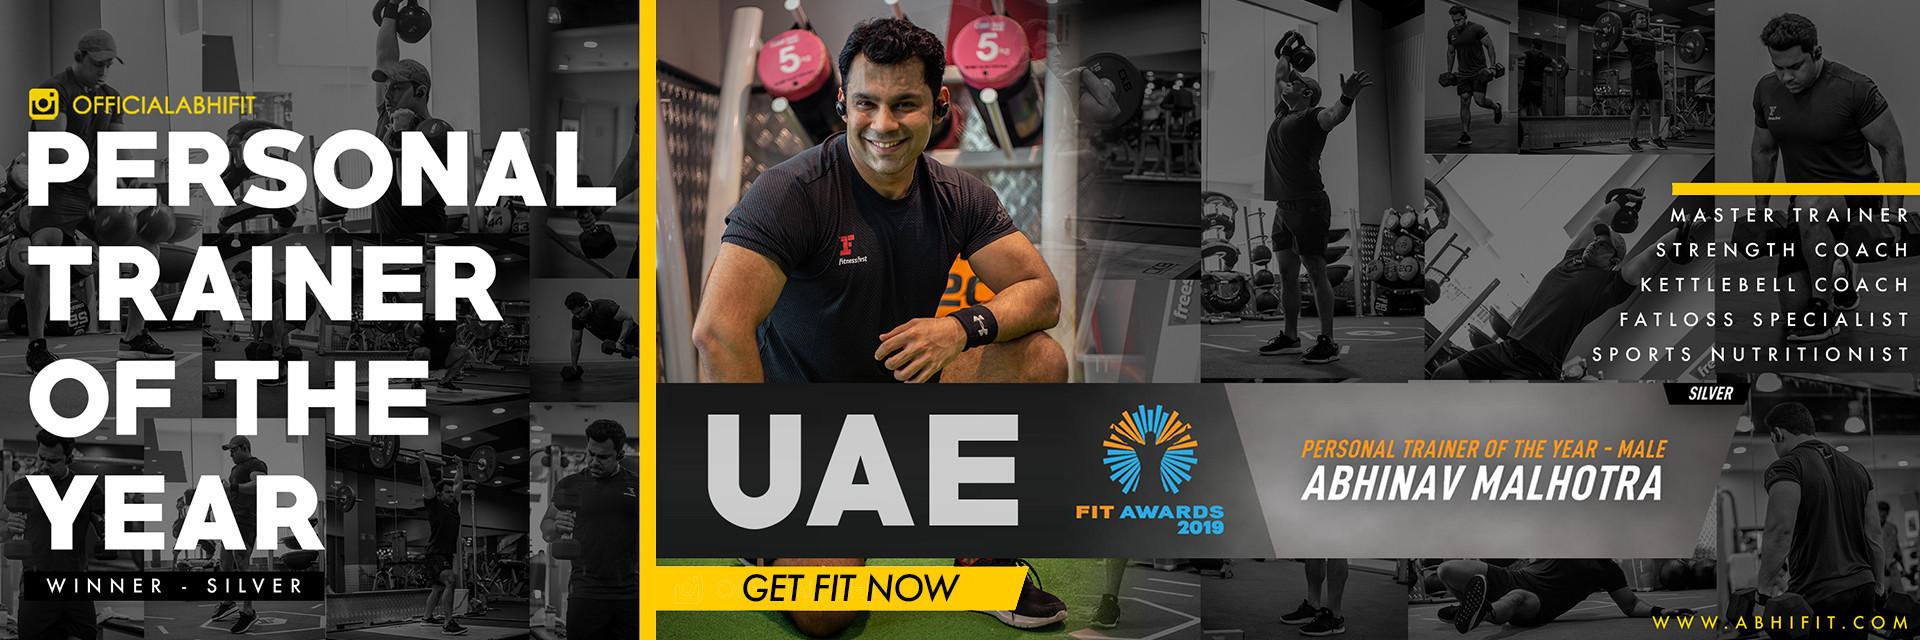 Abhinav Malhotra - Best Personal Trainer of UAE Dubai Abu Dhabi All Emirates - Health Fitness India